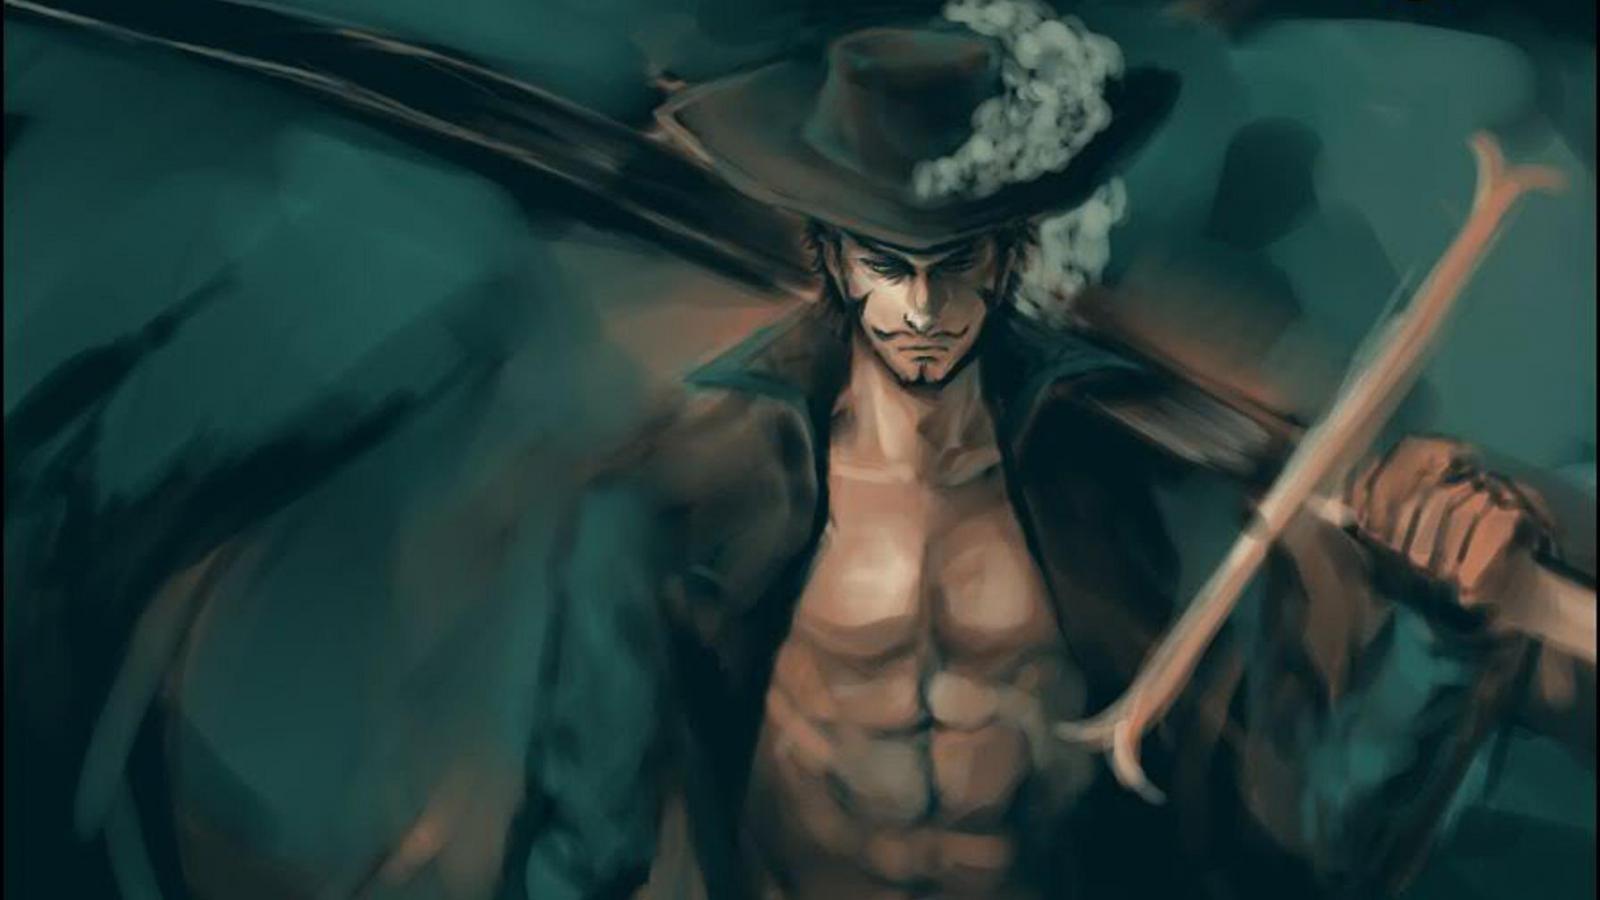 dracule mihawk your daily anime wallpaper and fan art